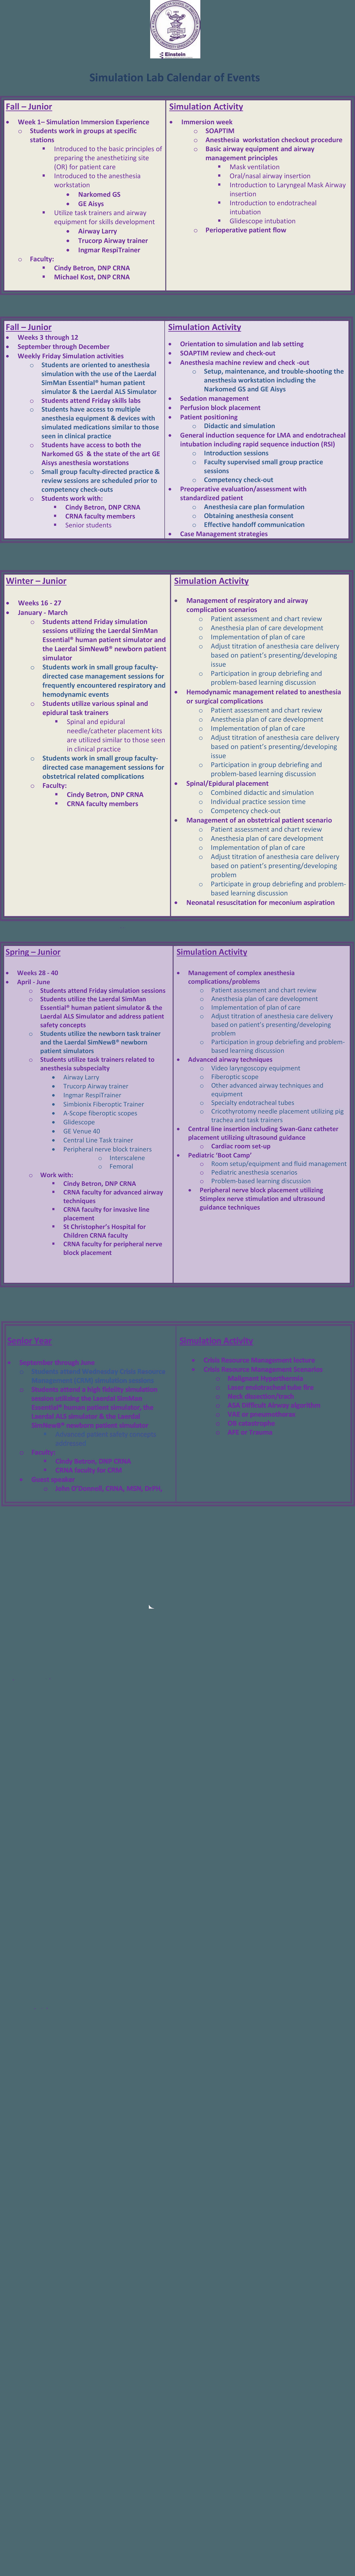 coe-page 2